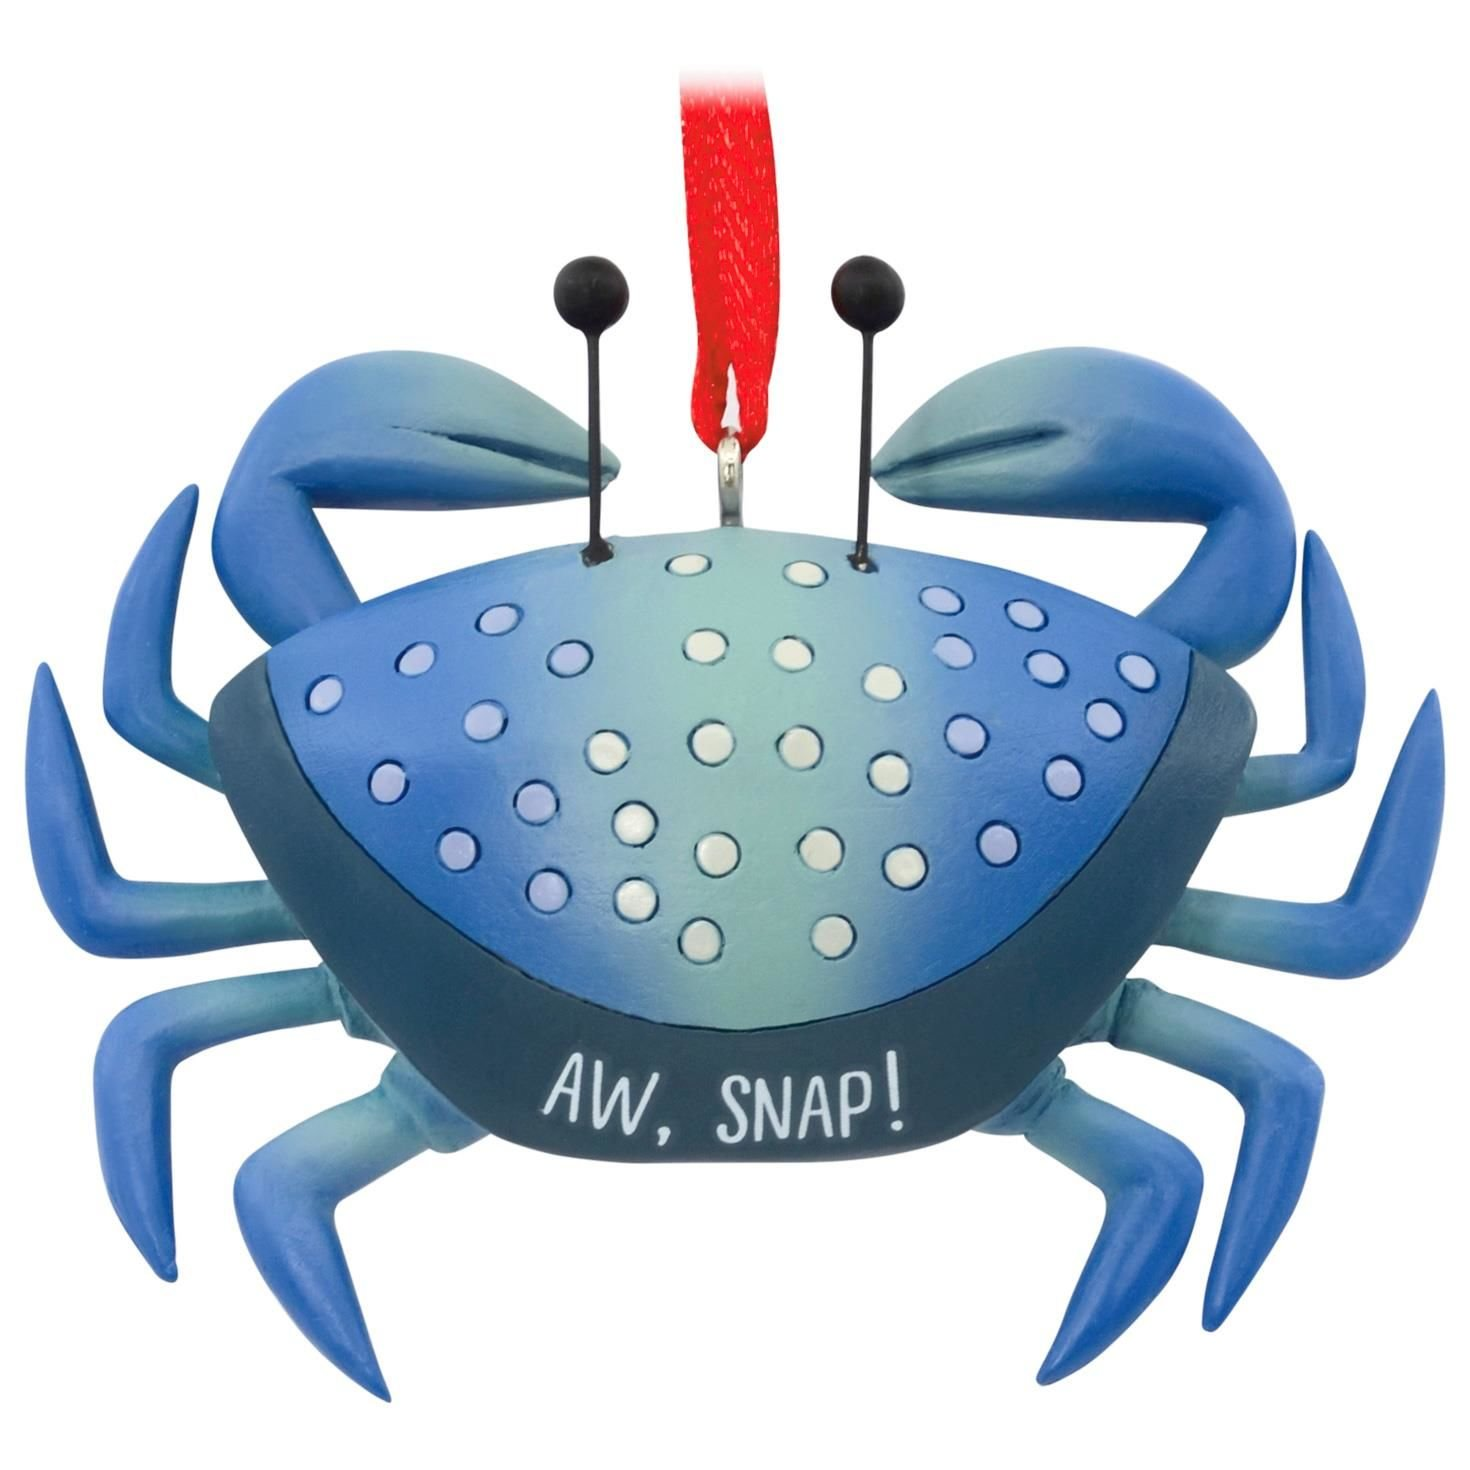 Aw, Snap Blue Crab Hallmark Ornament Animals & Nature